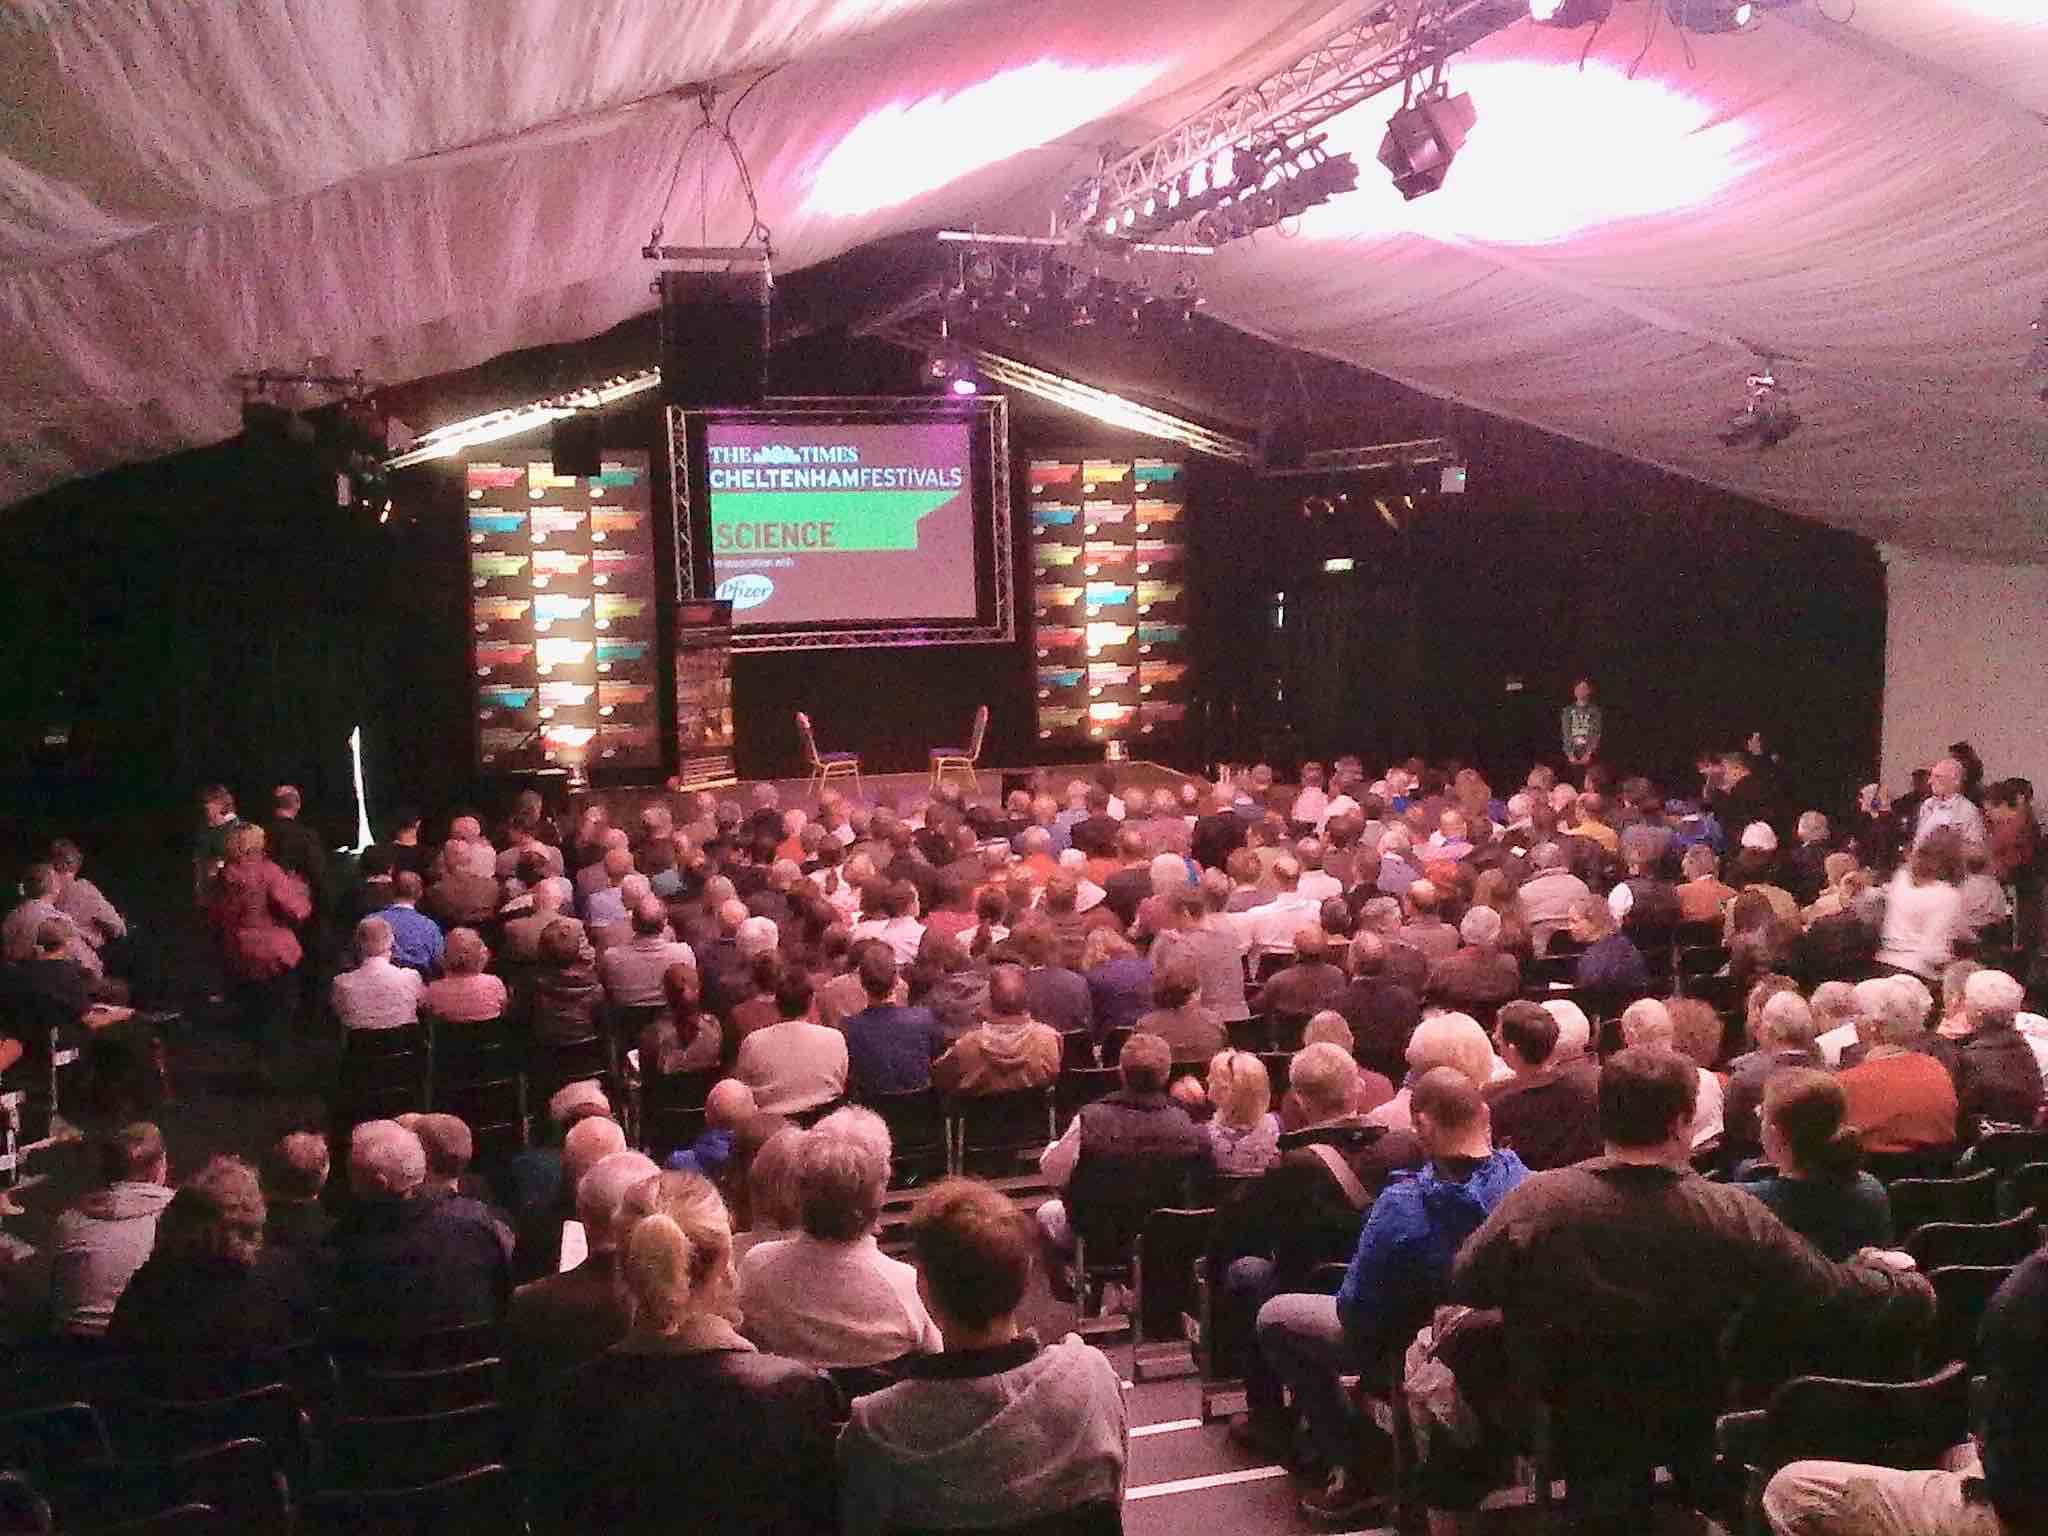 2012 Cheltenham Science Festival, Arena